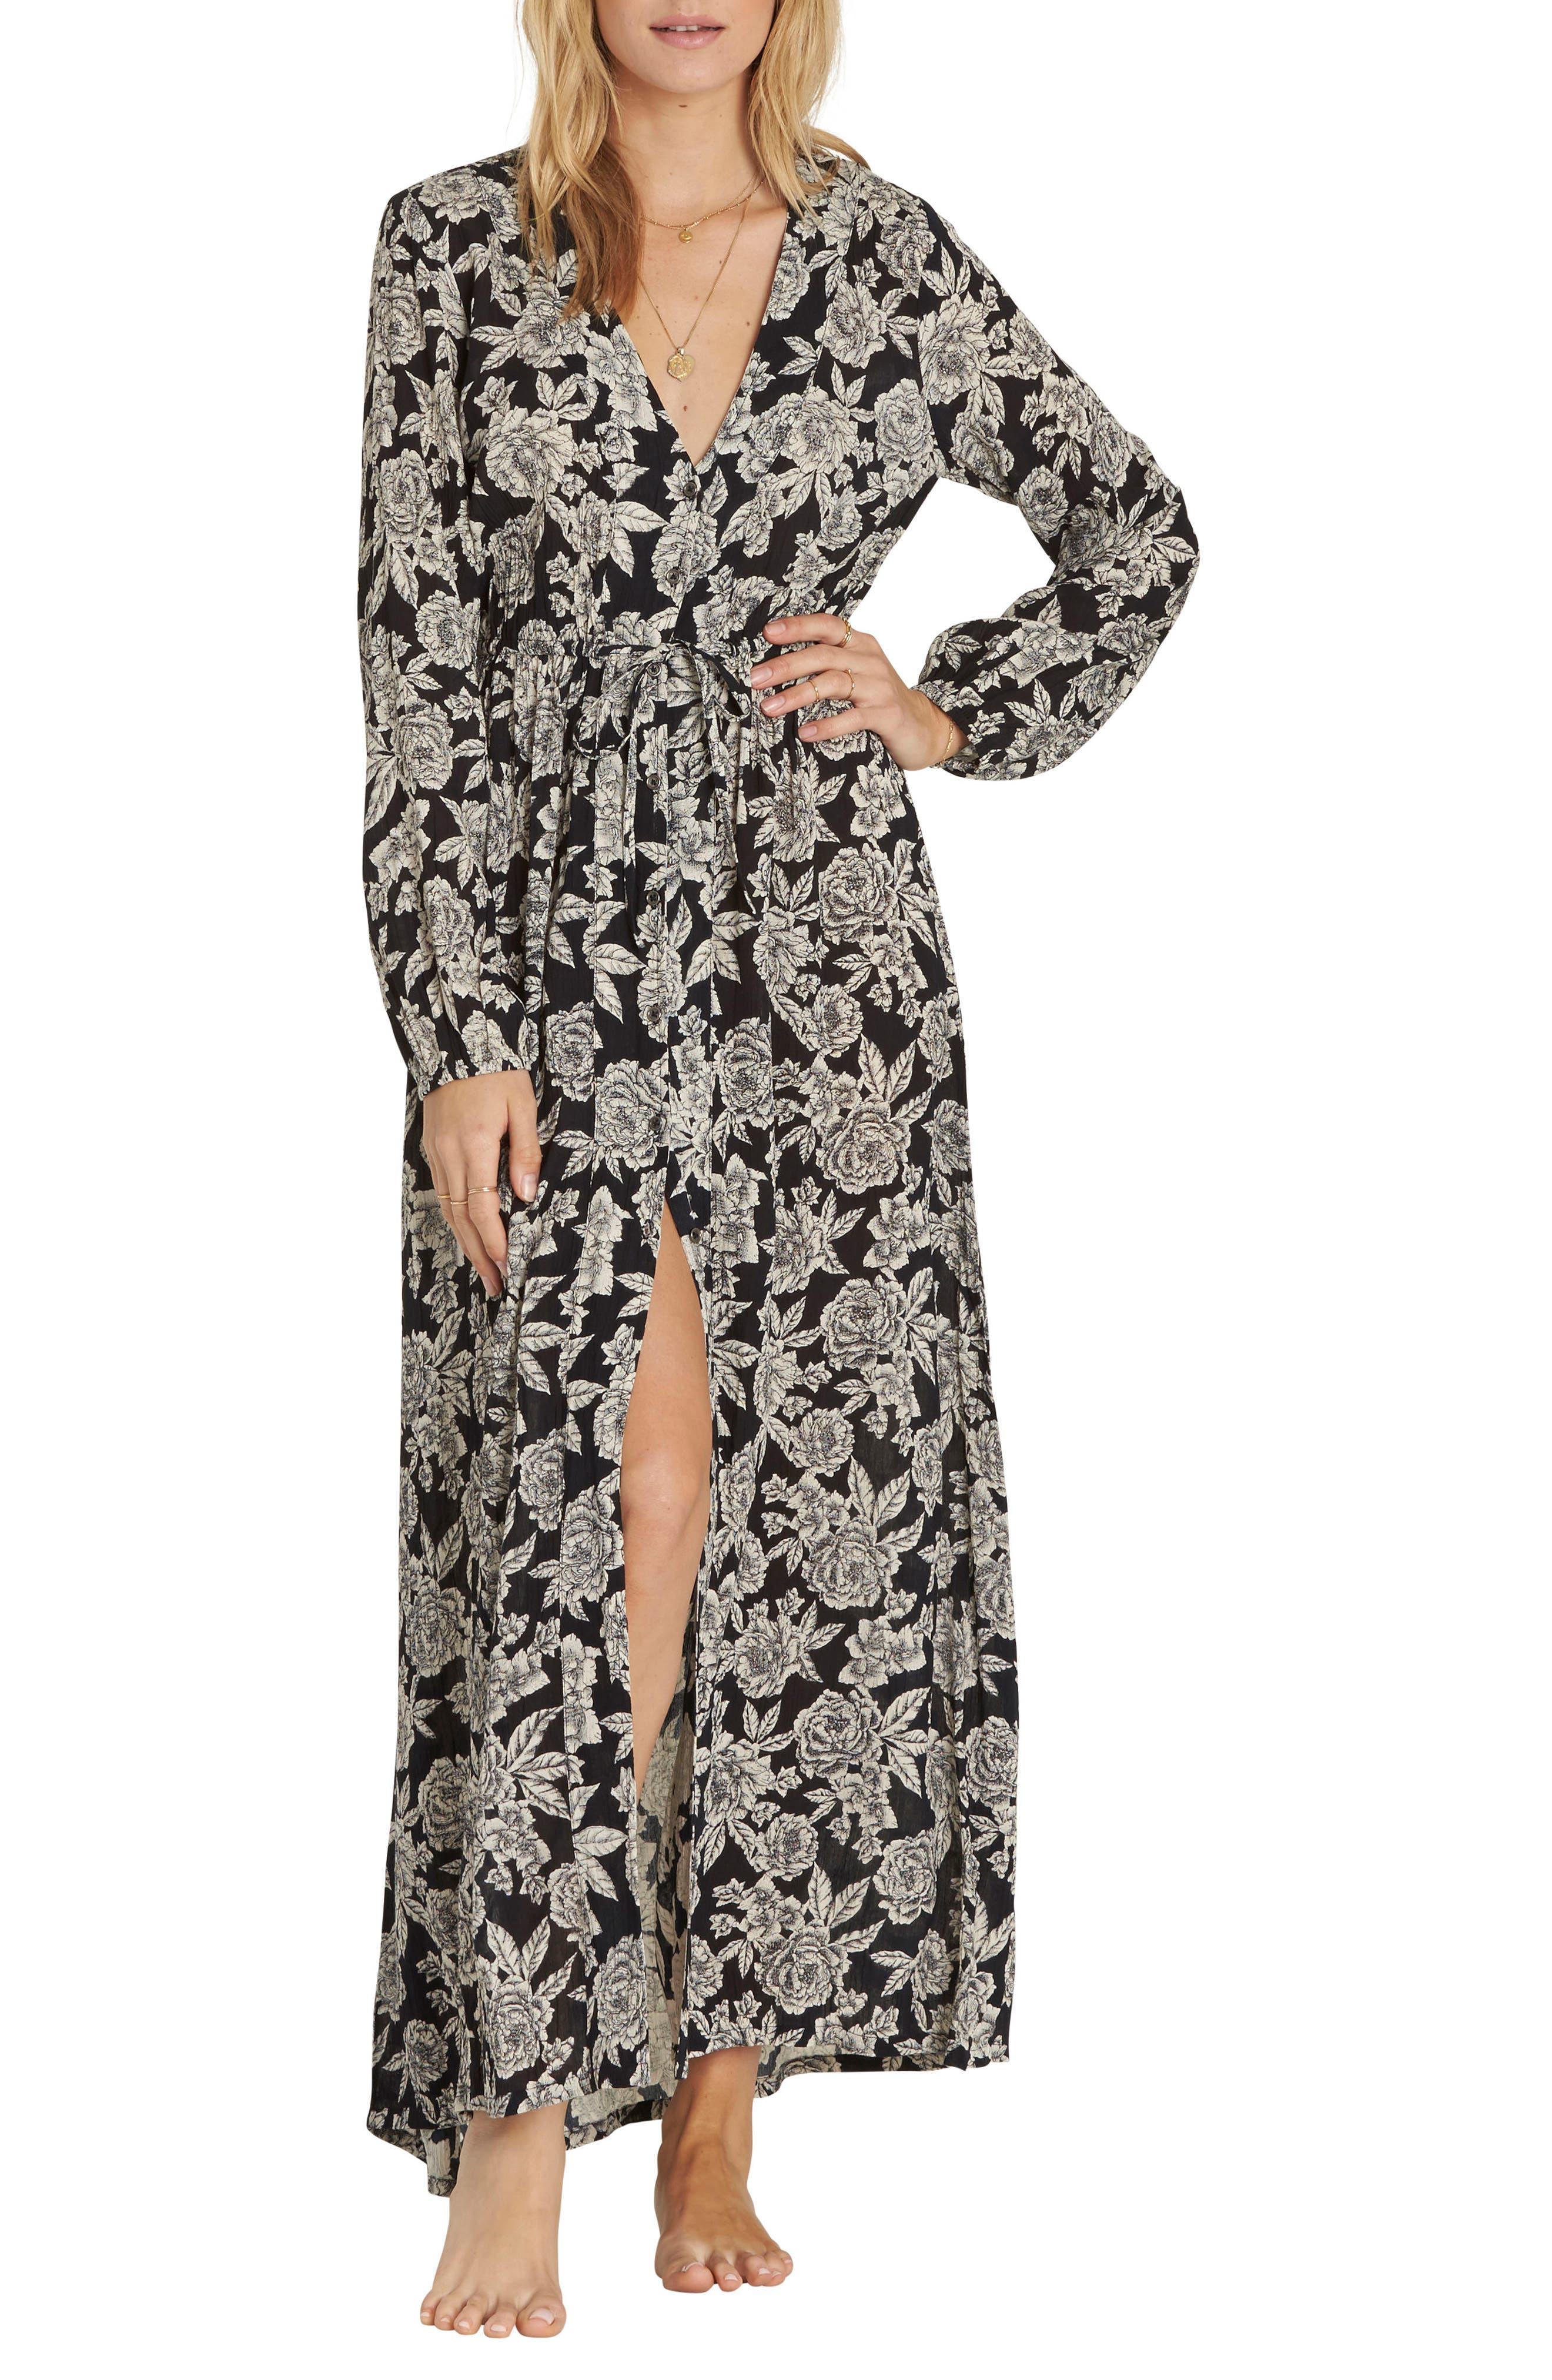 Allegra Kimono Dress,                         Main,                         color, Black/ White